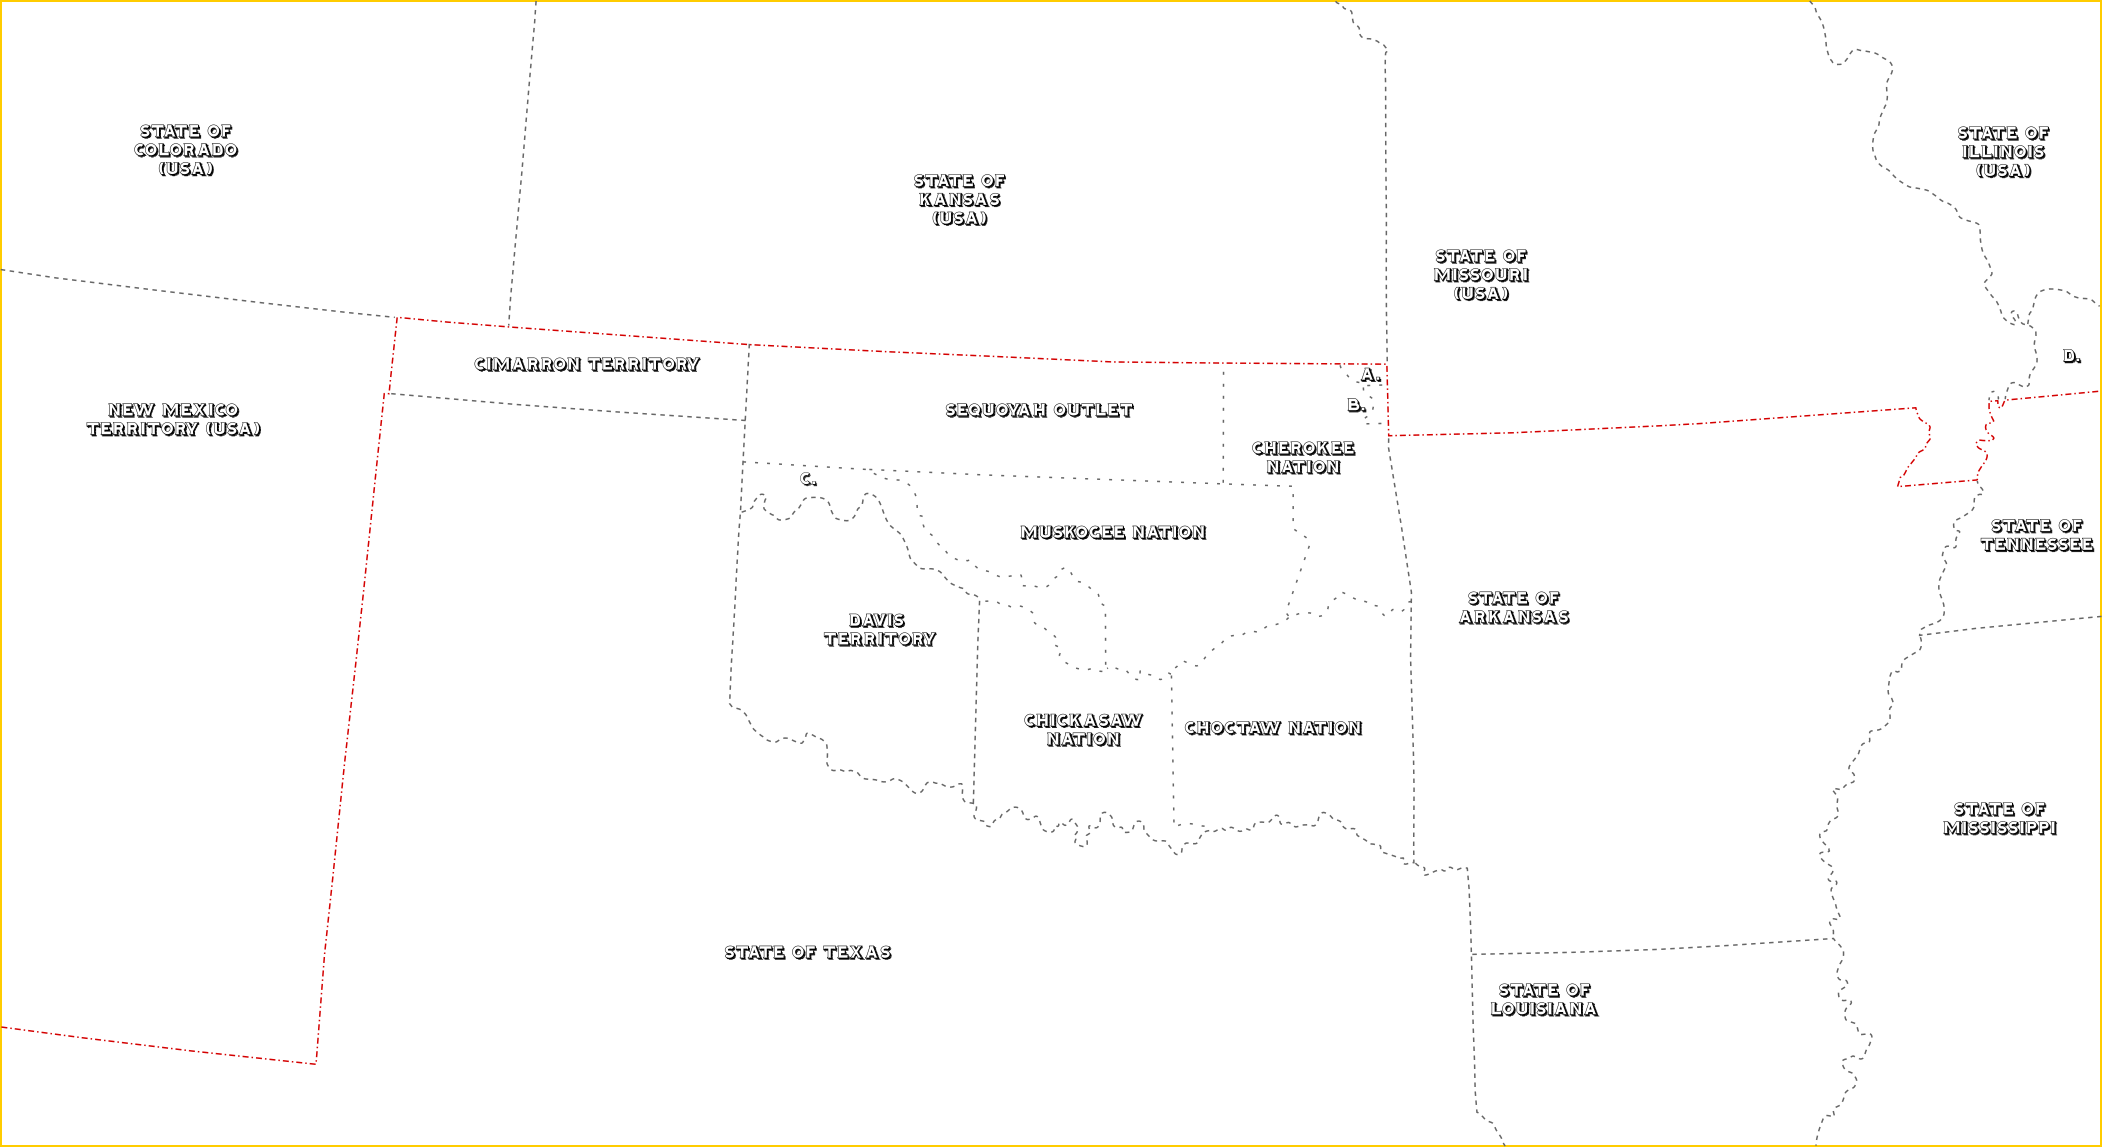 Oklahoma WiP.png